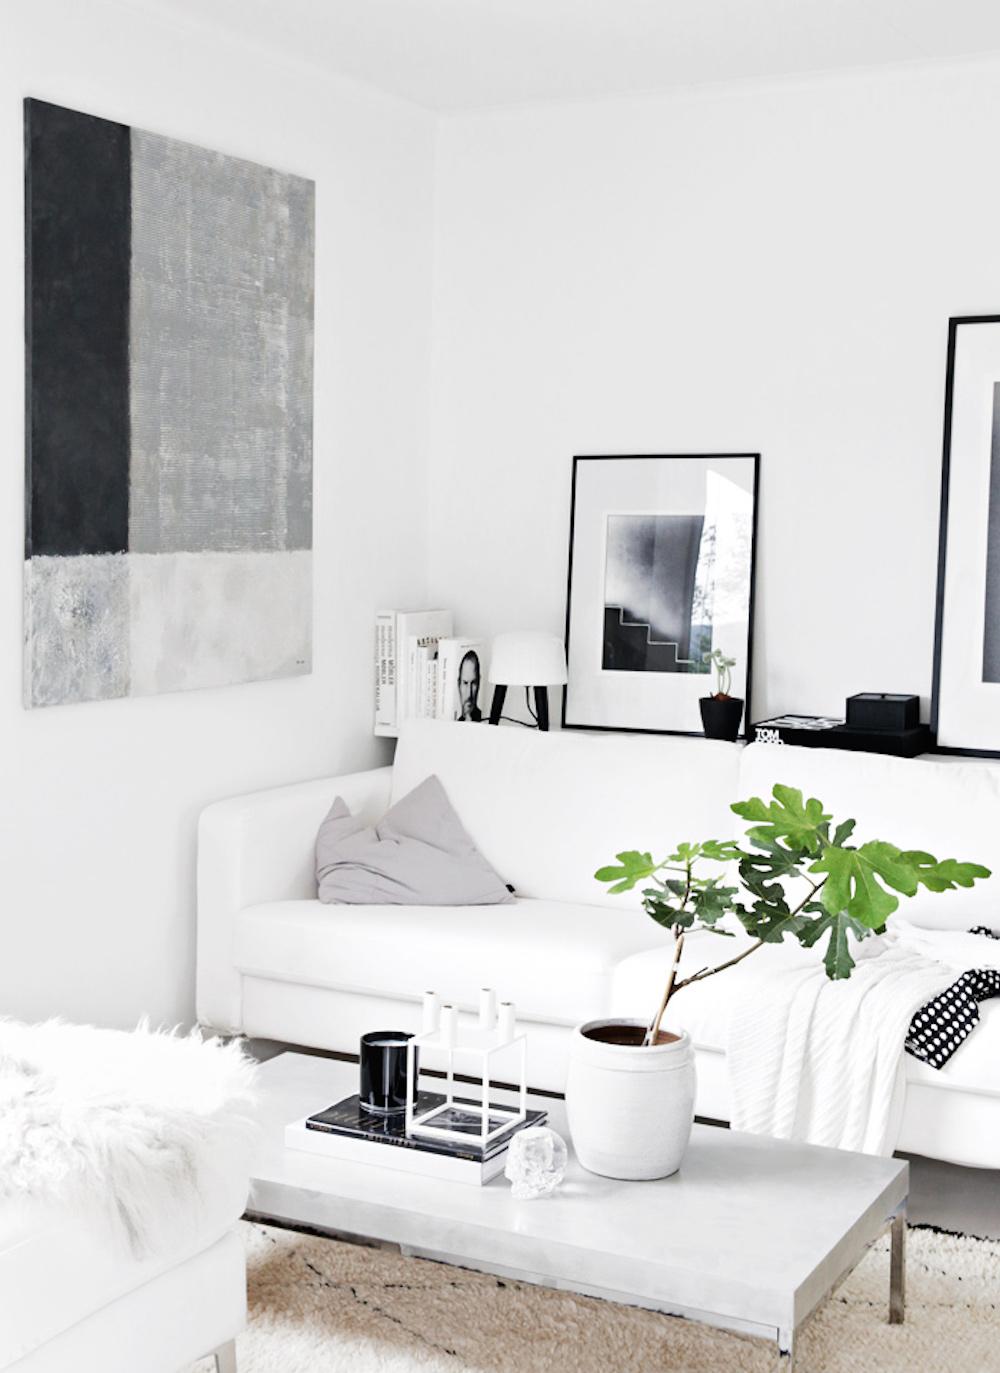 oracle, fox, sunday, sanctuary, black, white, grey, house, plants, monochrome, minimal, interior